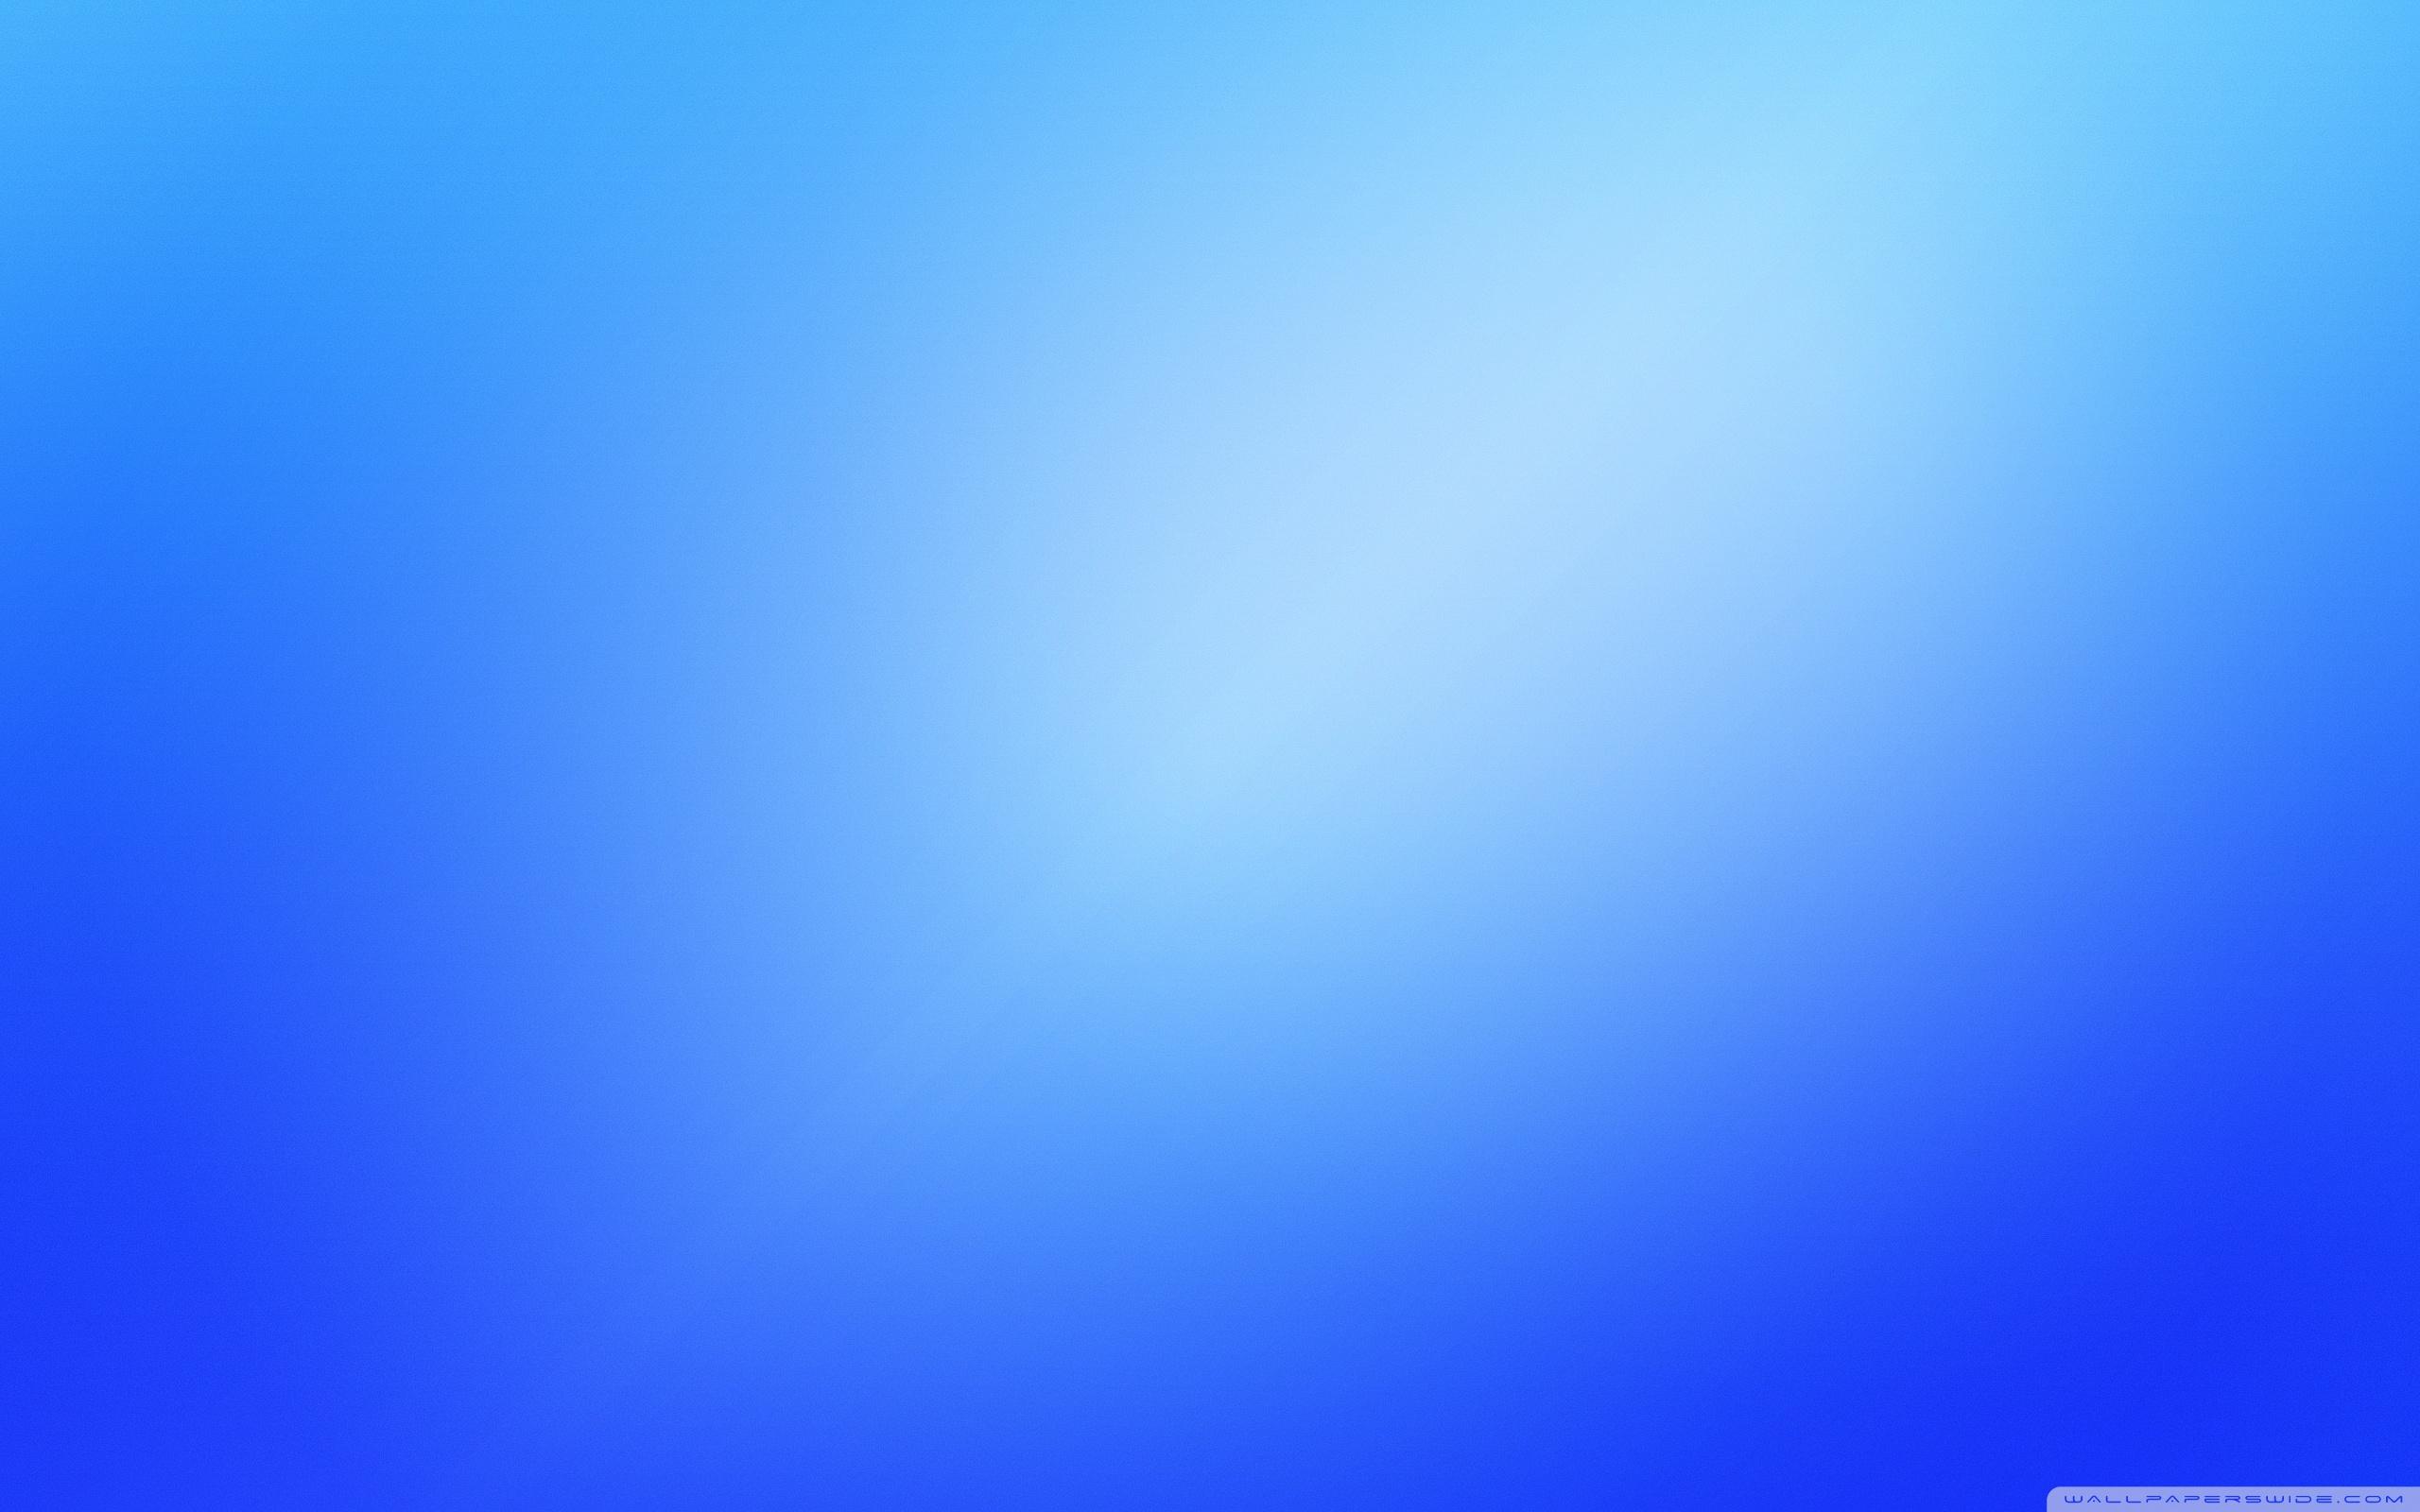 blue background wallpaper 2560x1600 56932 vintage space poster